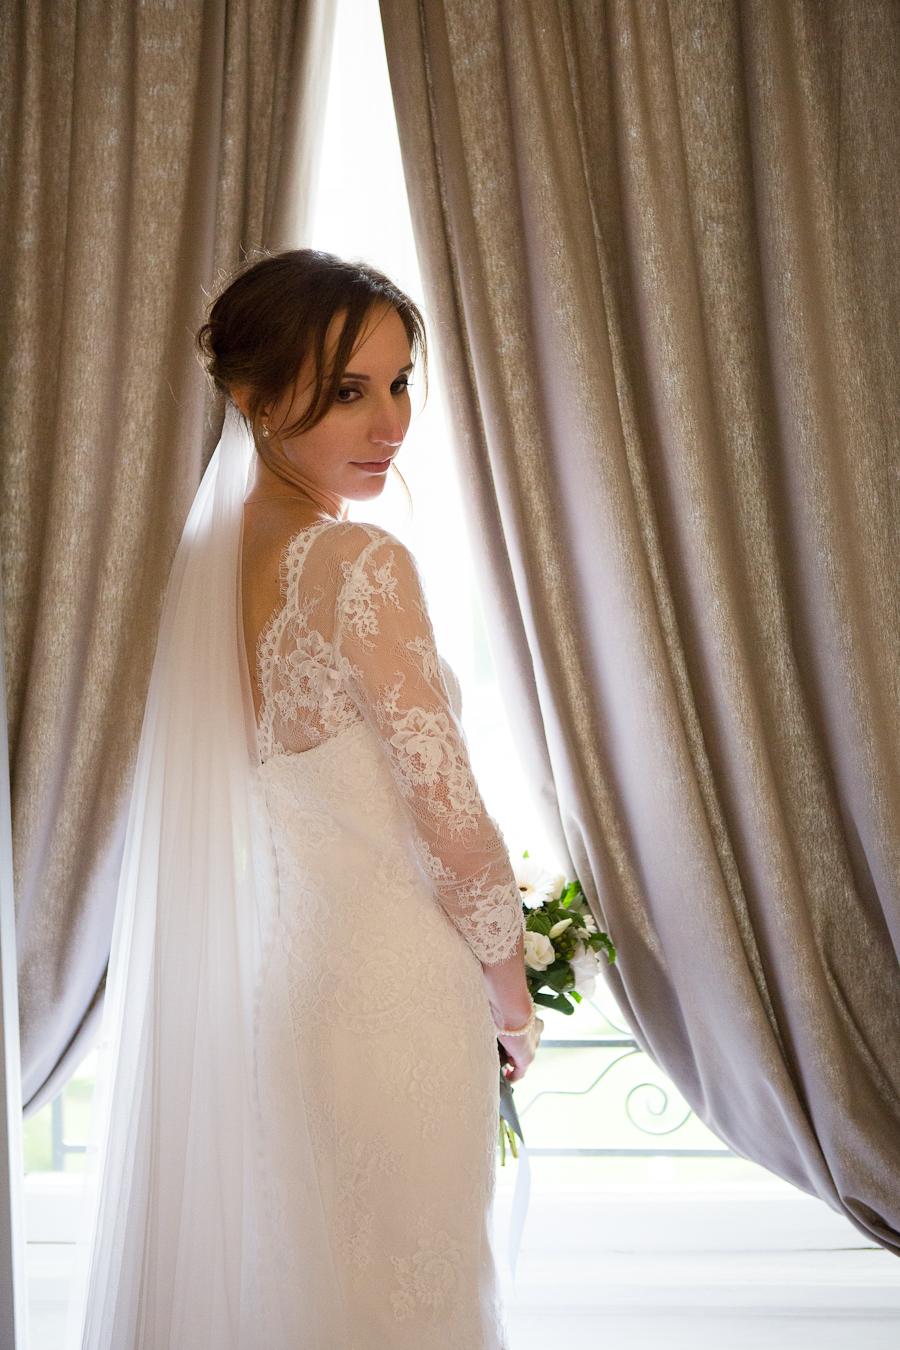 photographe-reportage-mariage-keith-flament-chateau-aveny-40